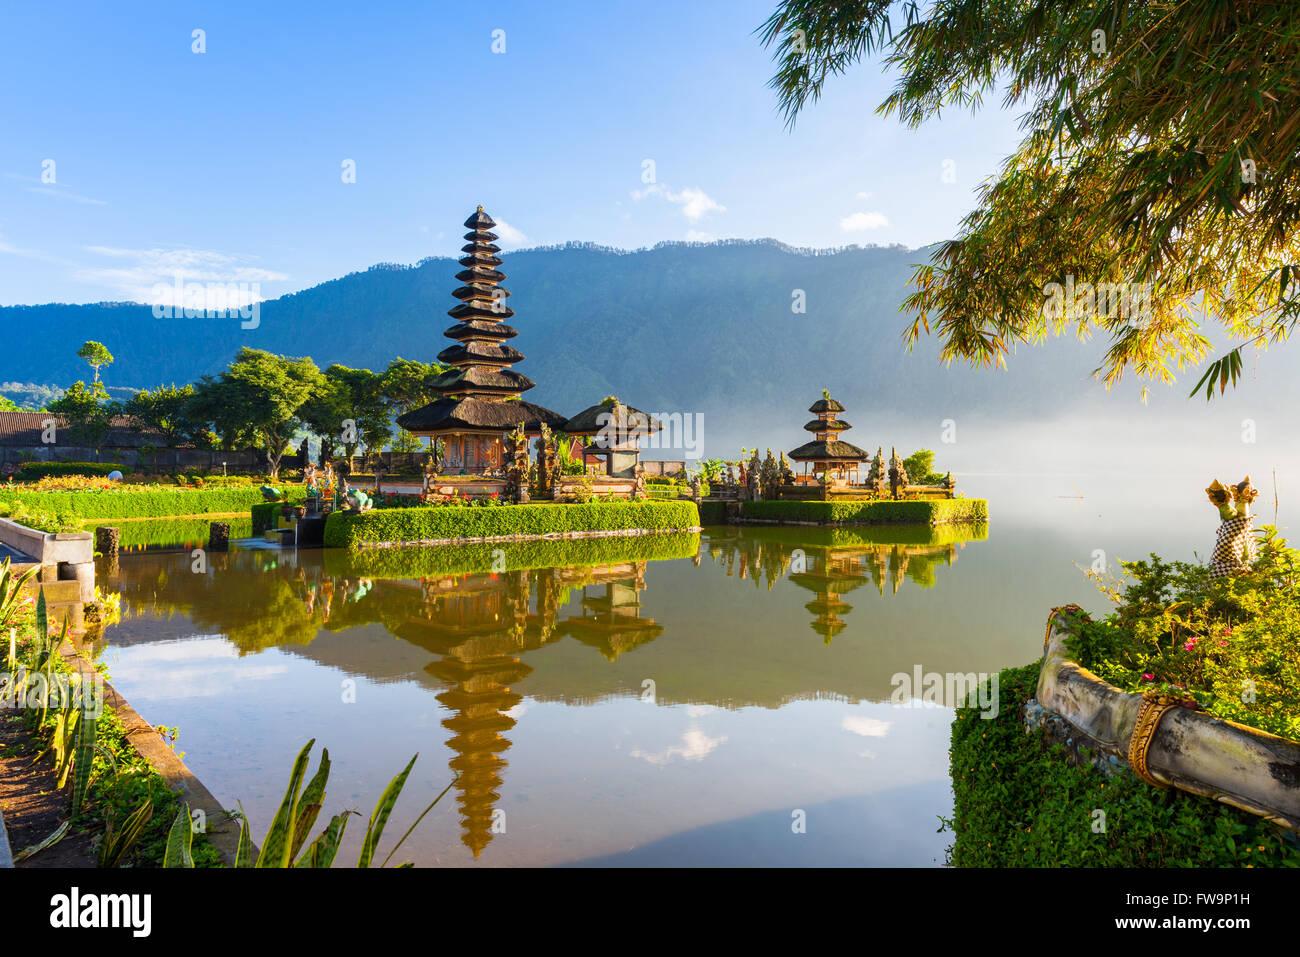 Pura Ulun Danu Bratan at sunrise, famous temple on the lake, Bedugul, Bali, Indonesia. Stock Photo